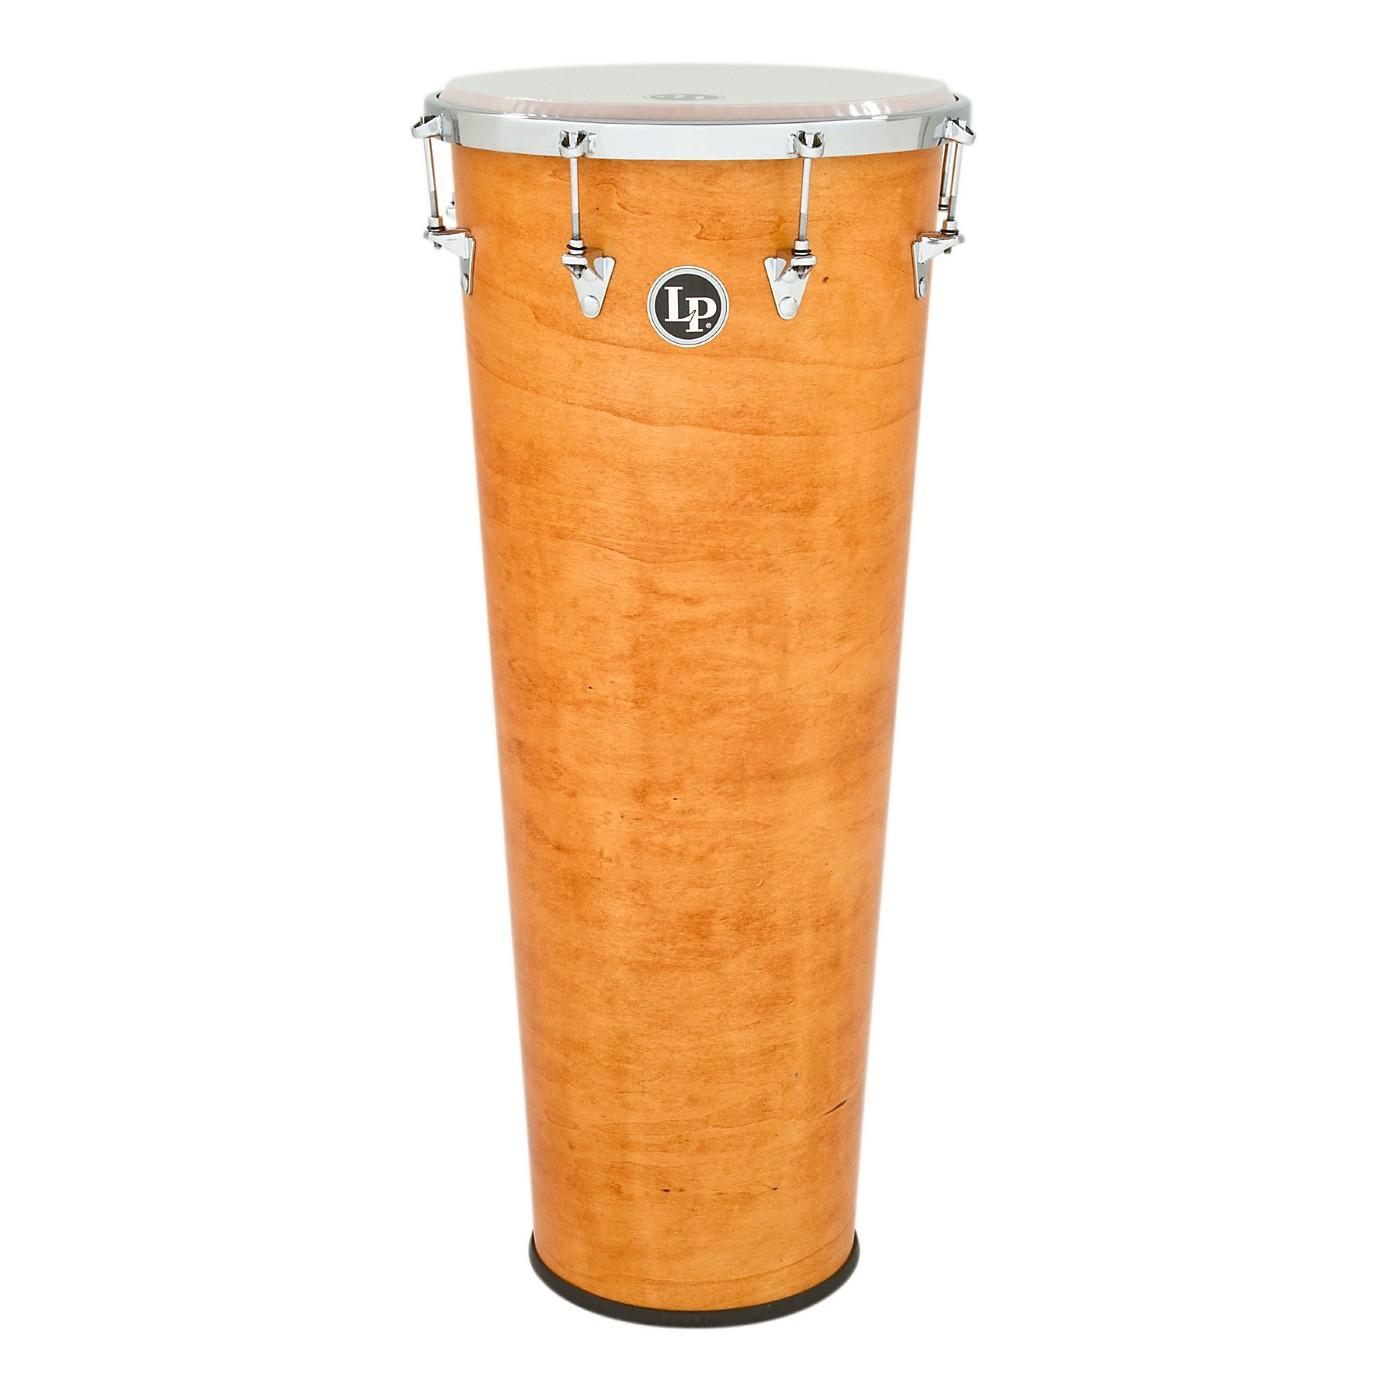 LP Timbau Percussion Instrument thumbnail